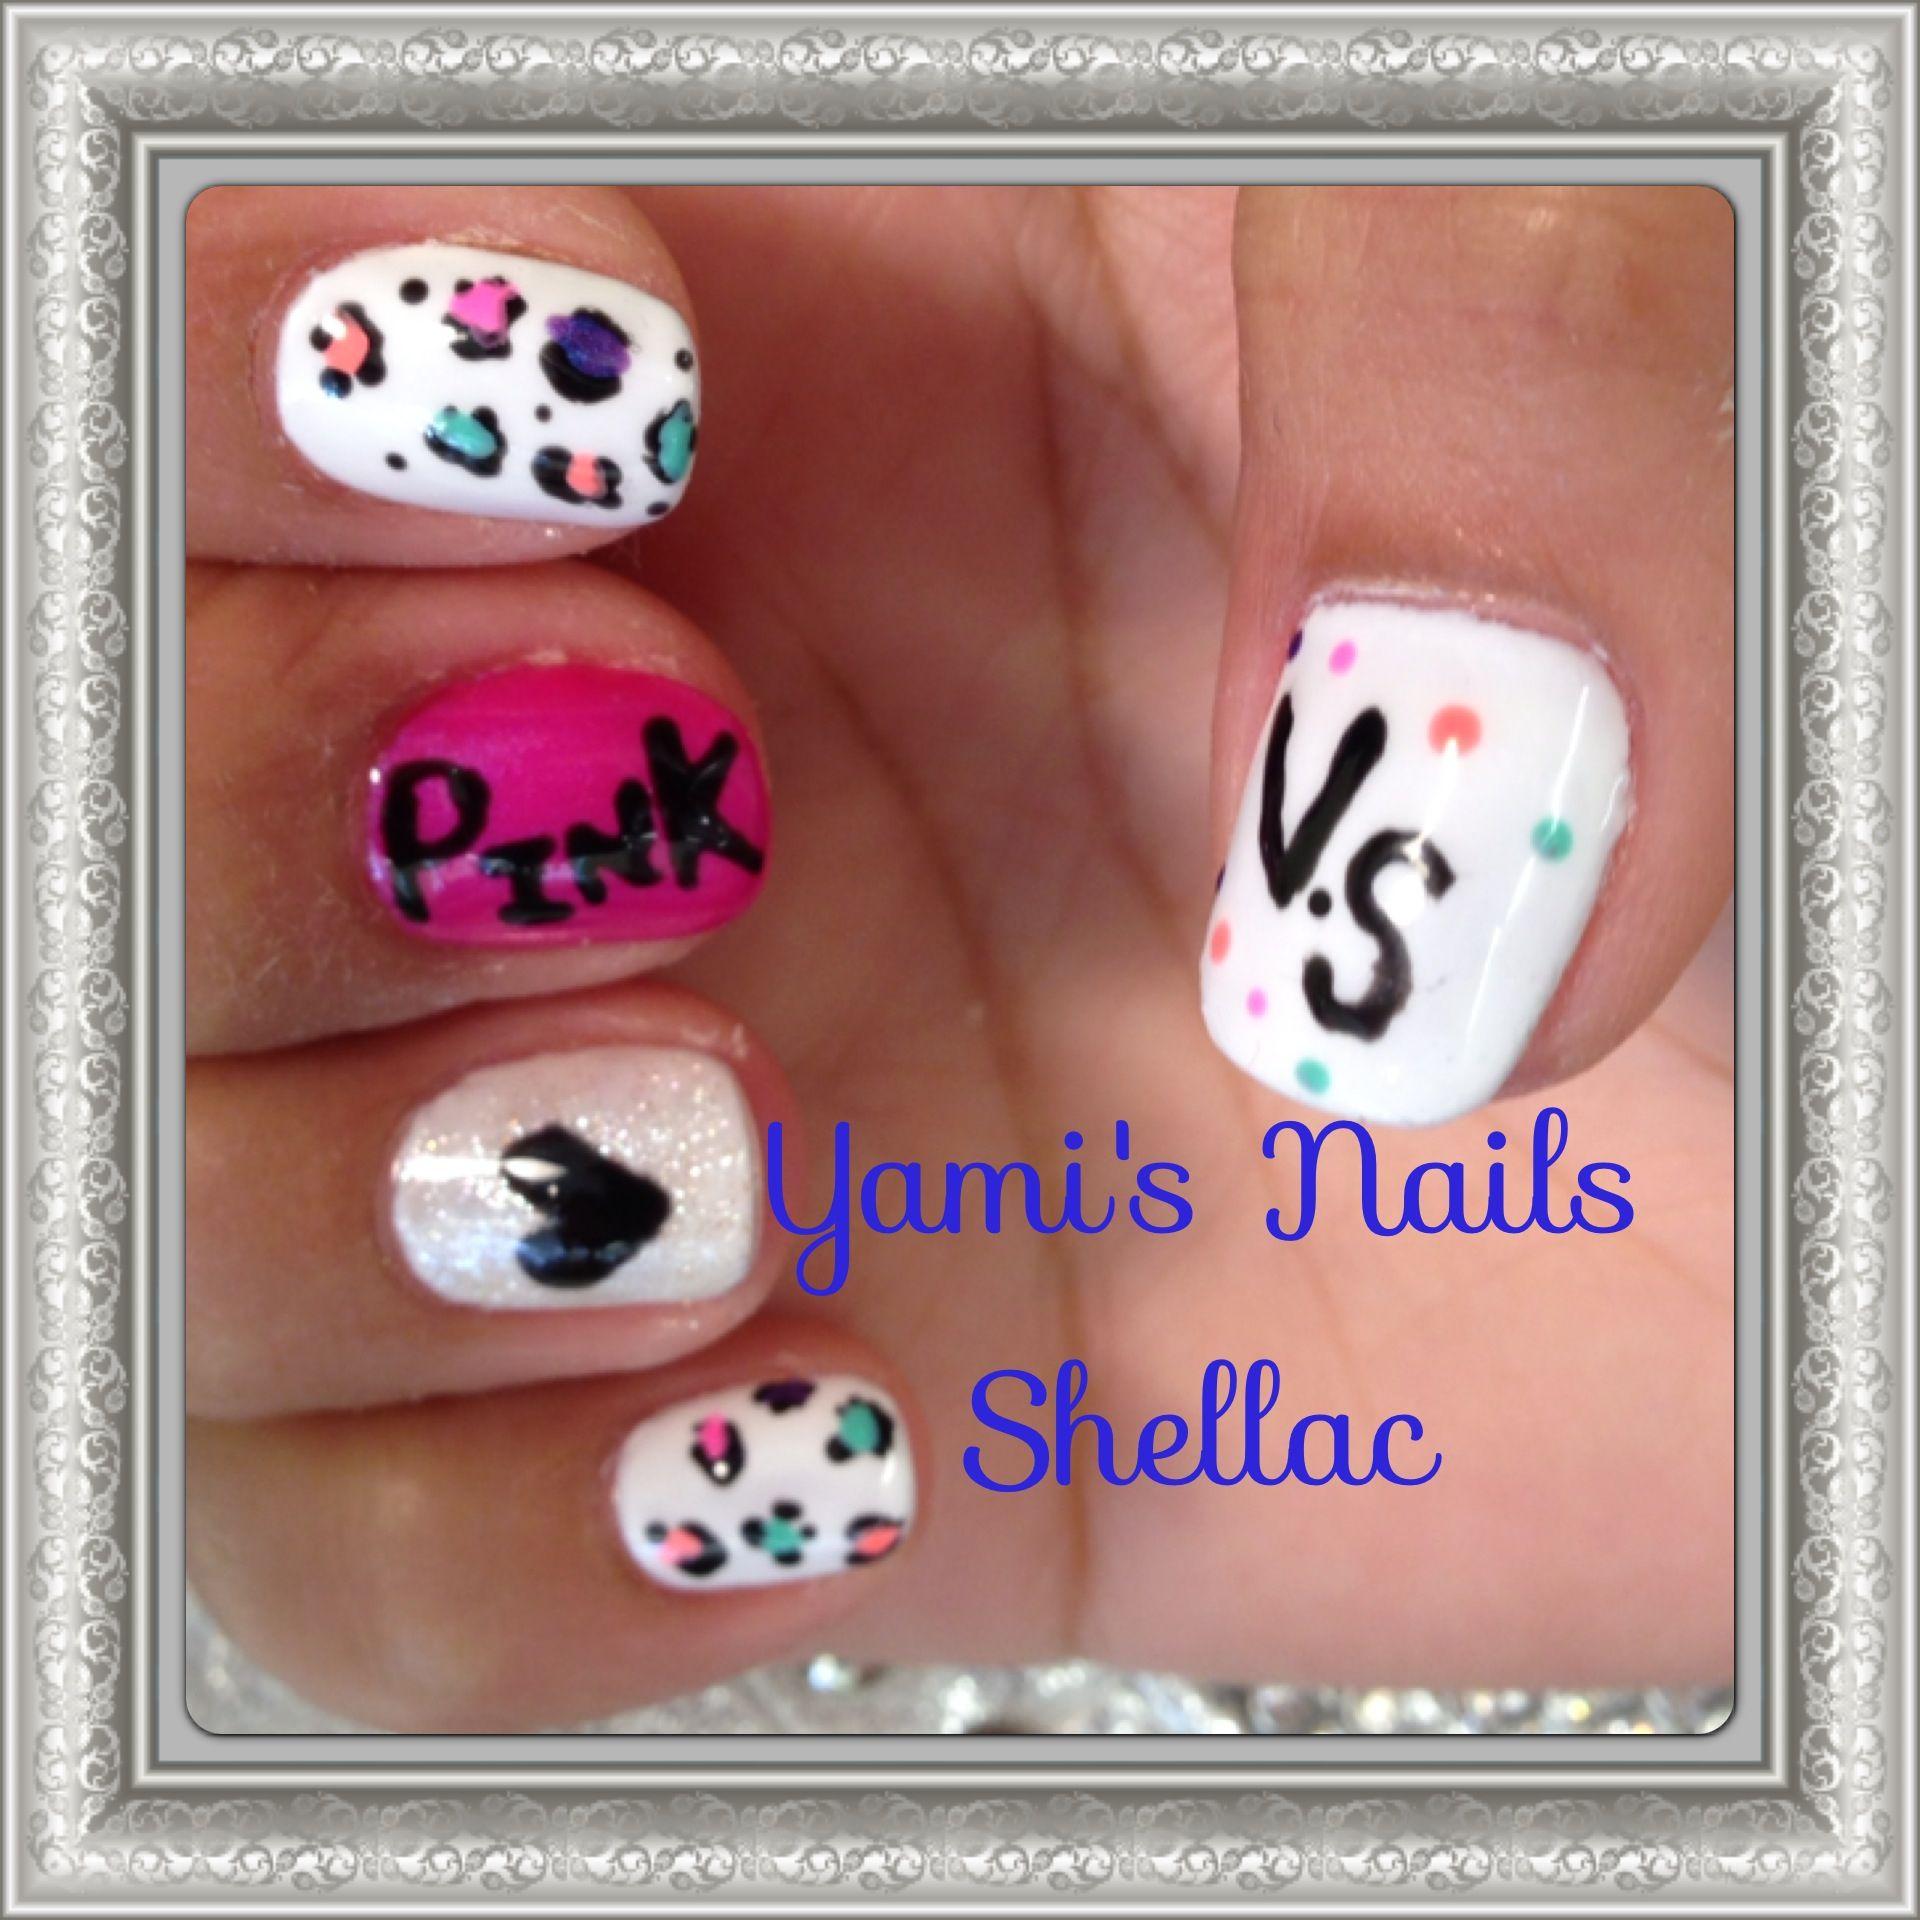 Nail design Victoria secret gel nailpolish   Nail shellac   Pinterest